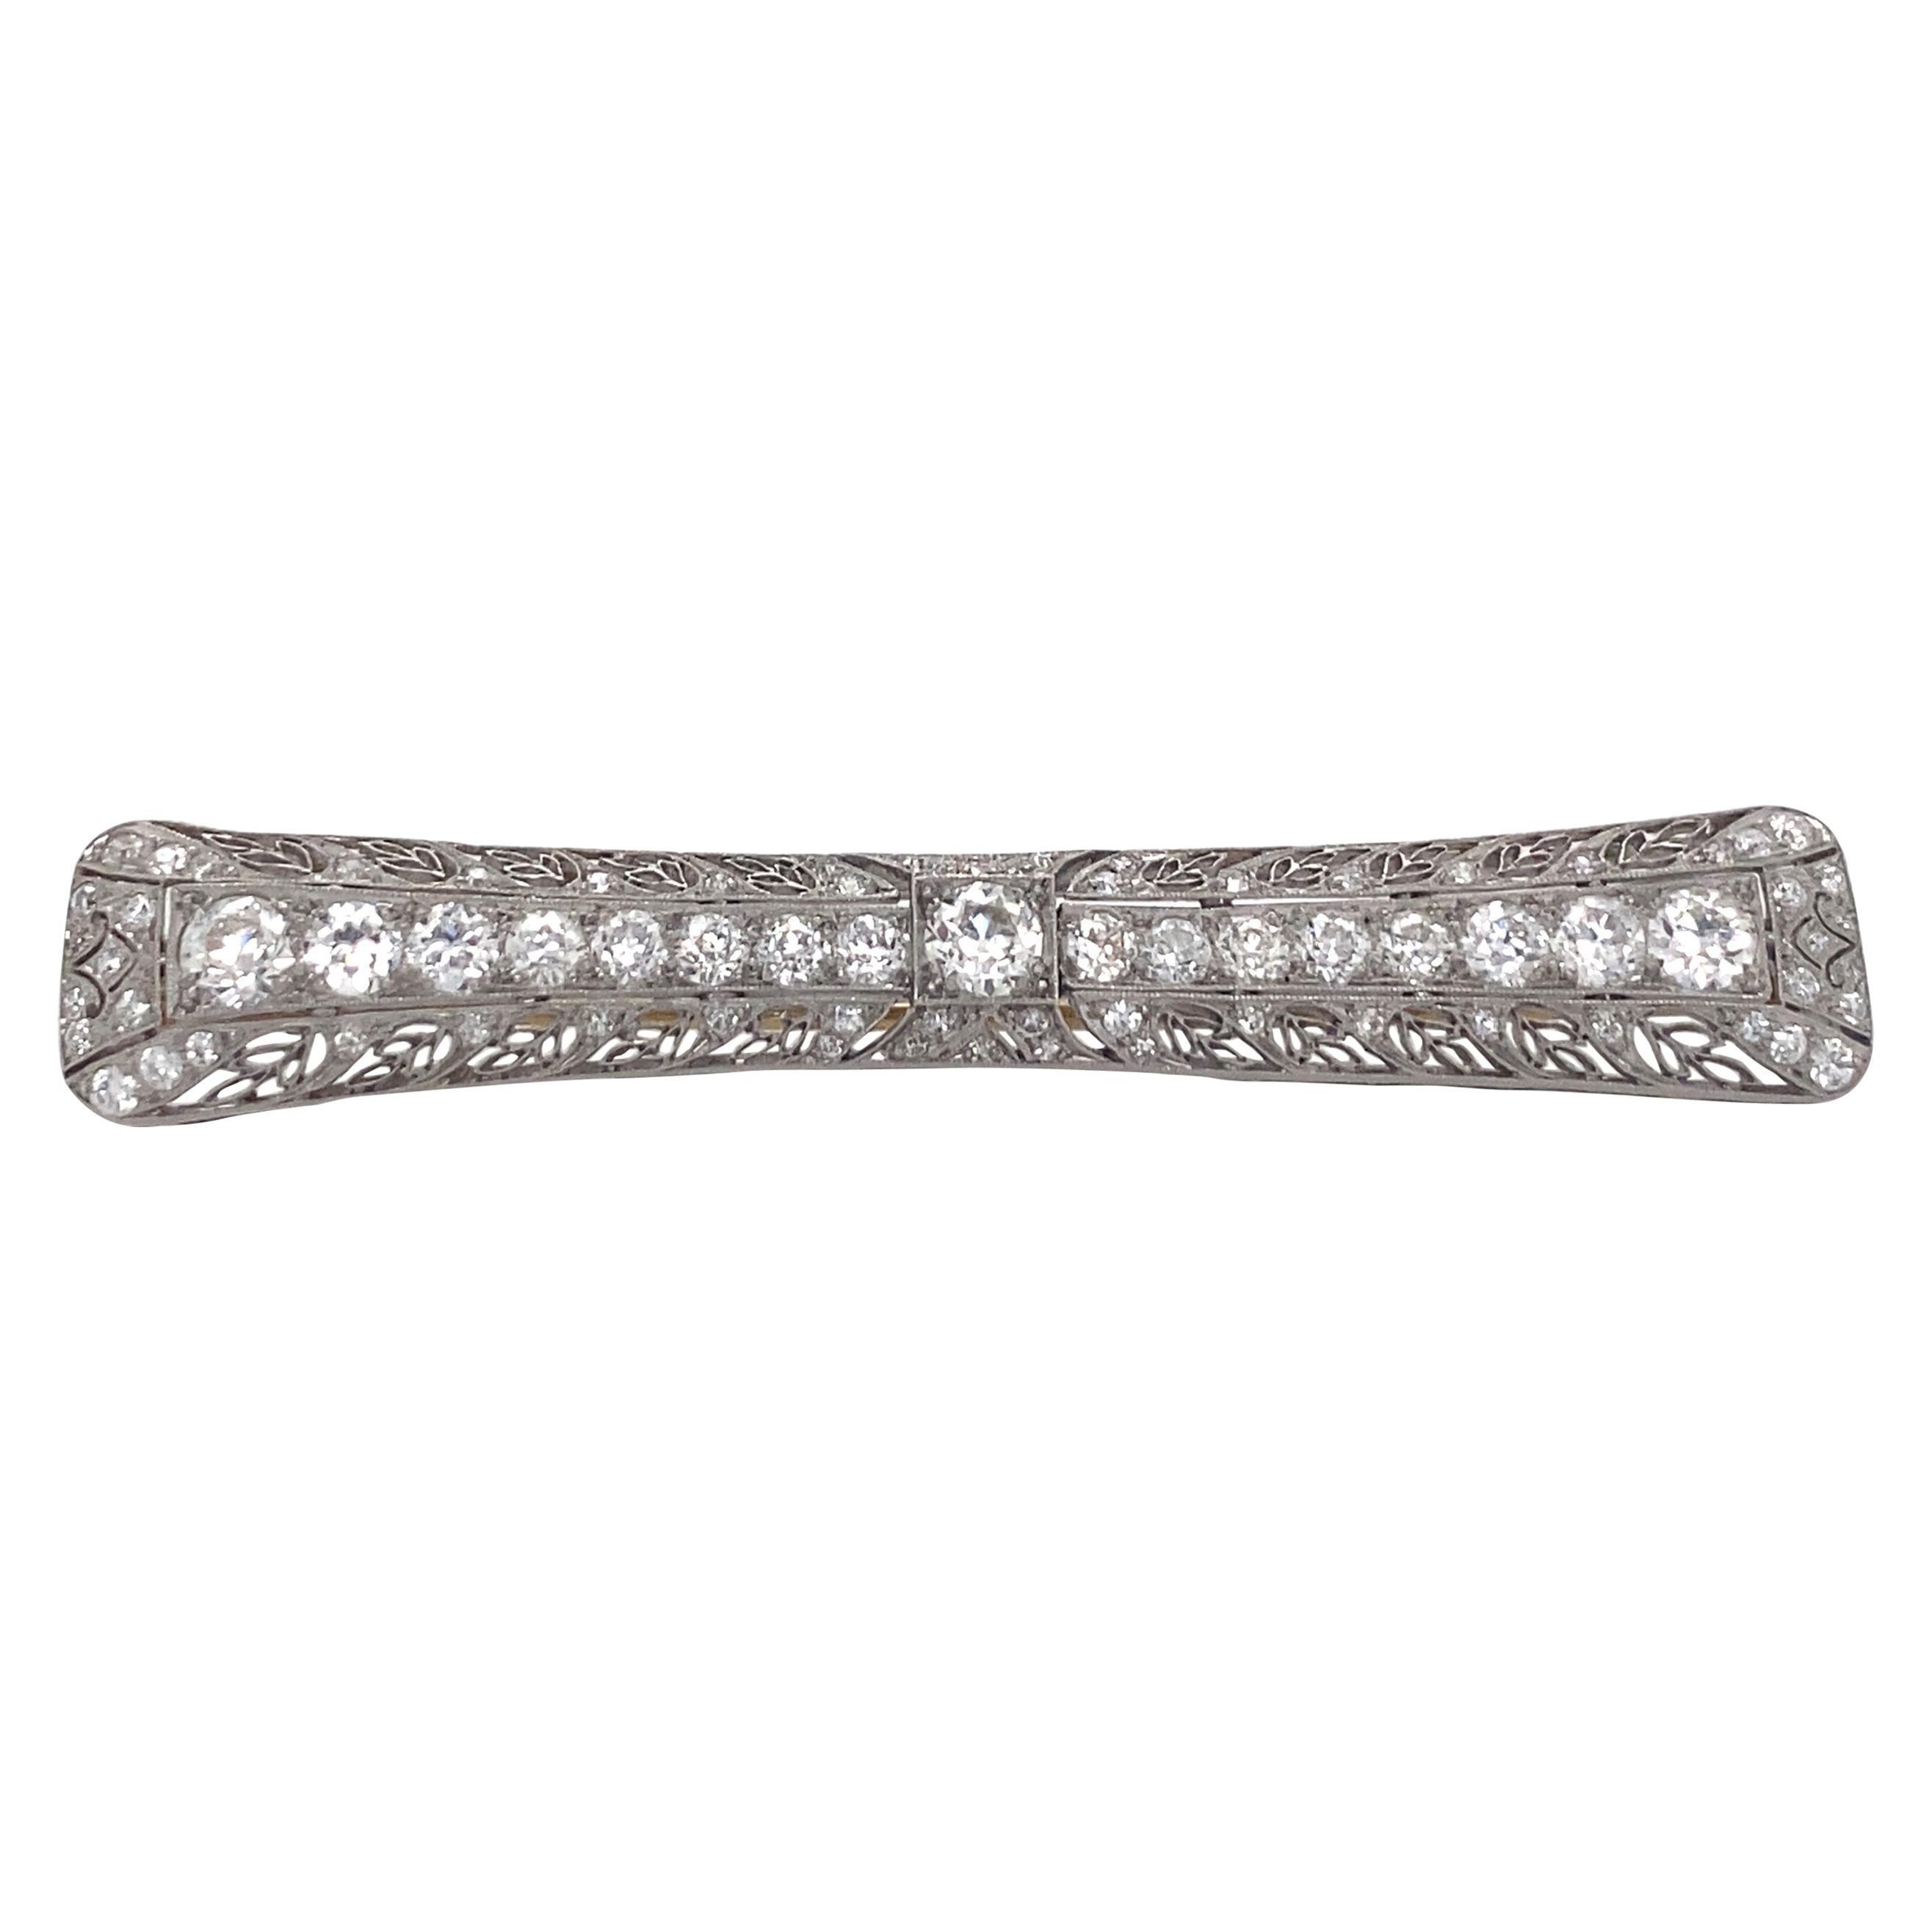 Tiffany & Co. Platinum Diamond Art Deco Bar Pin Brooch